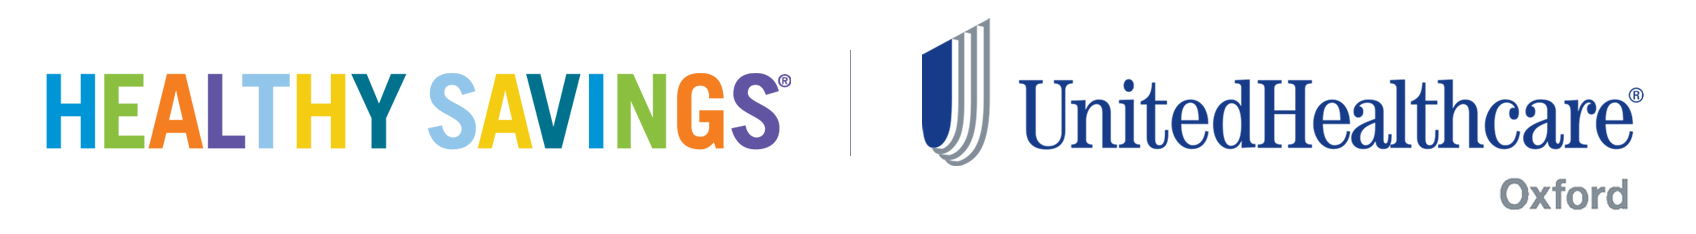 Healthy savings logo